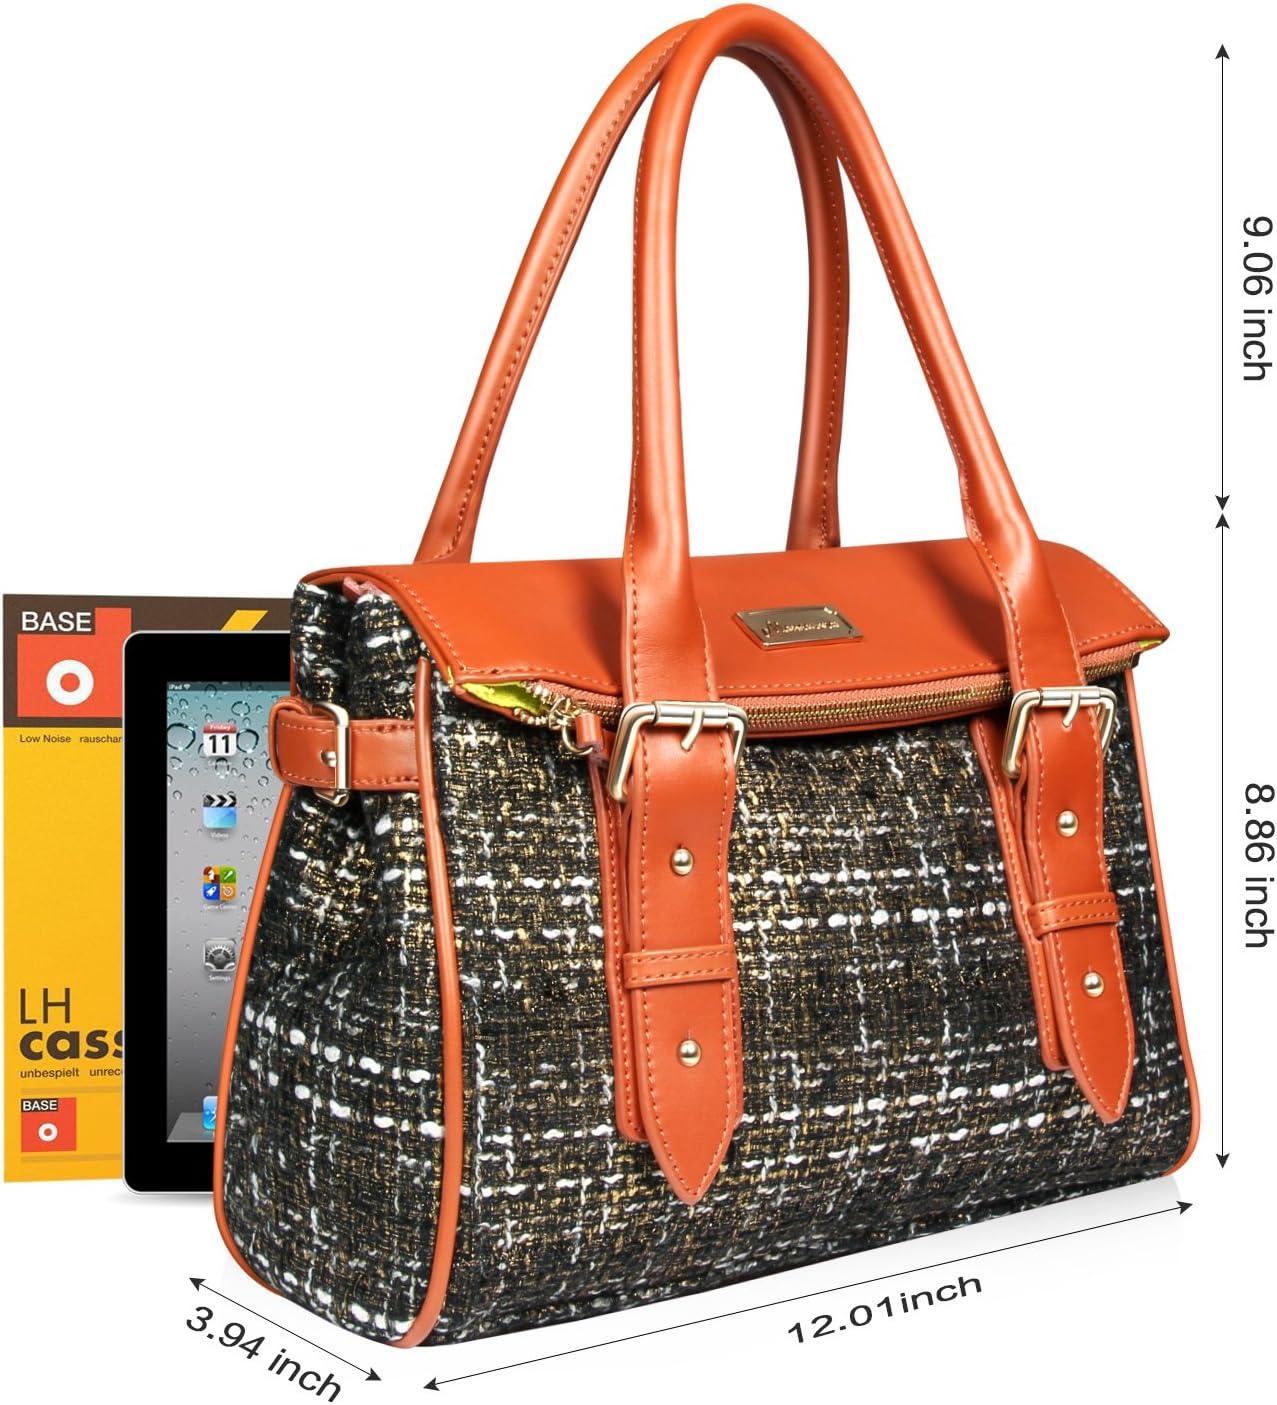 Mansarovar Womens Genuine Leather Handbags Top Handle Shoulder Bag Tote Bag Satchels Purses for Ladies